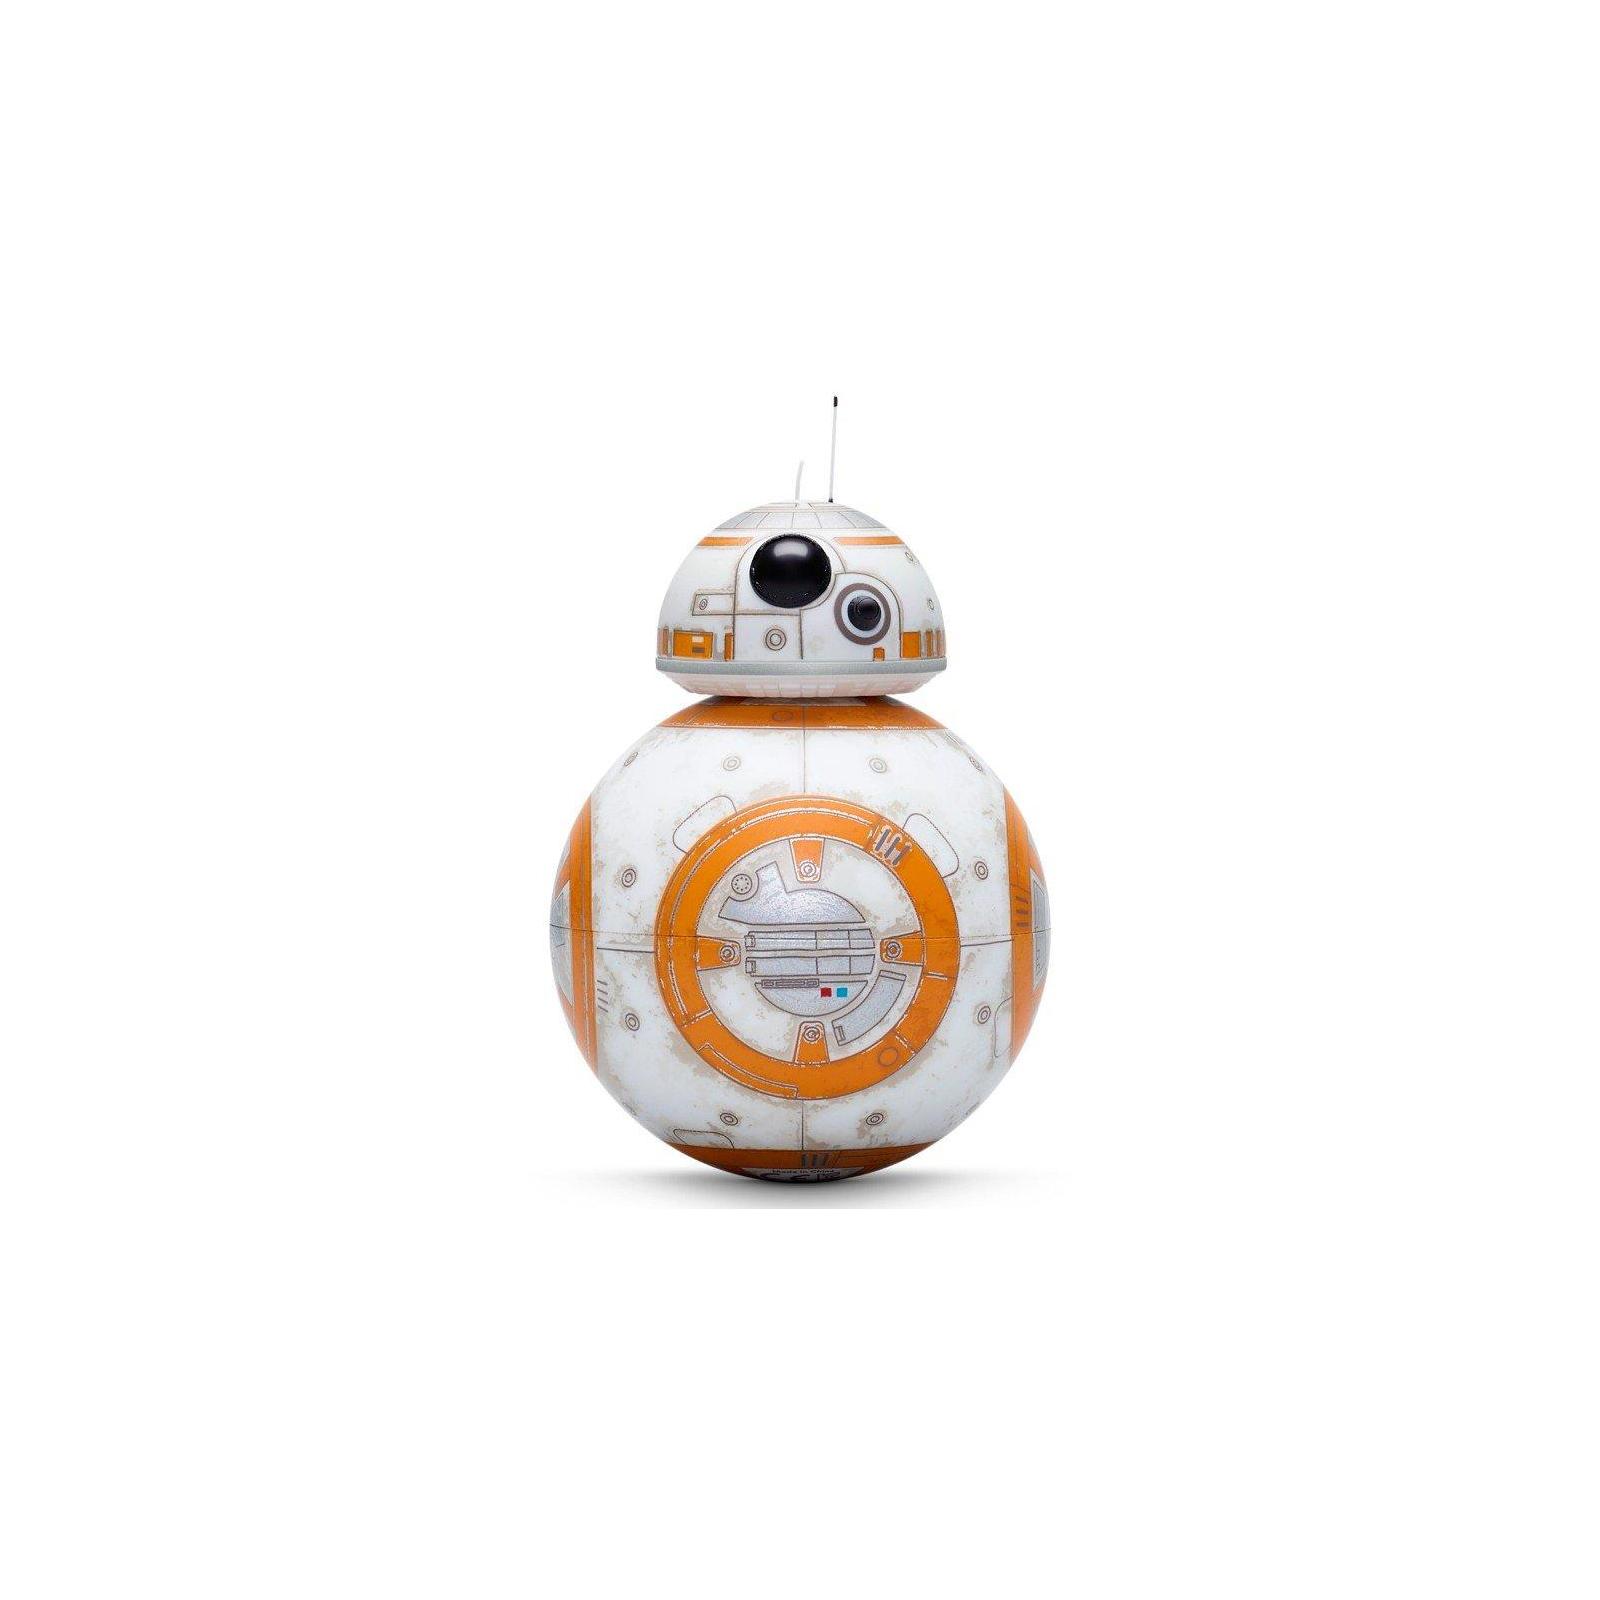 Робот Sphero BB-8 Special Edition with Force Band (322384) изображение 5